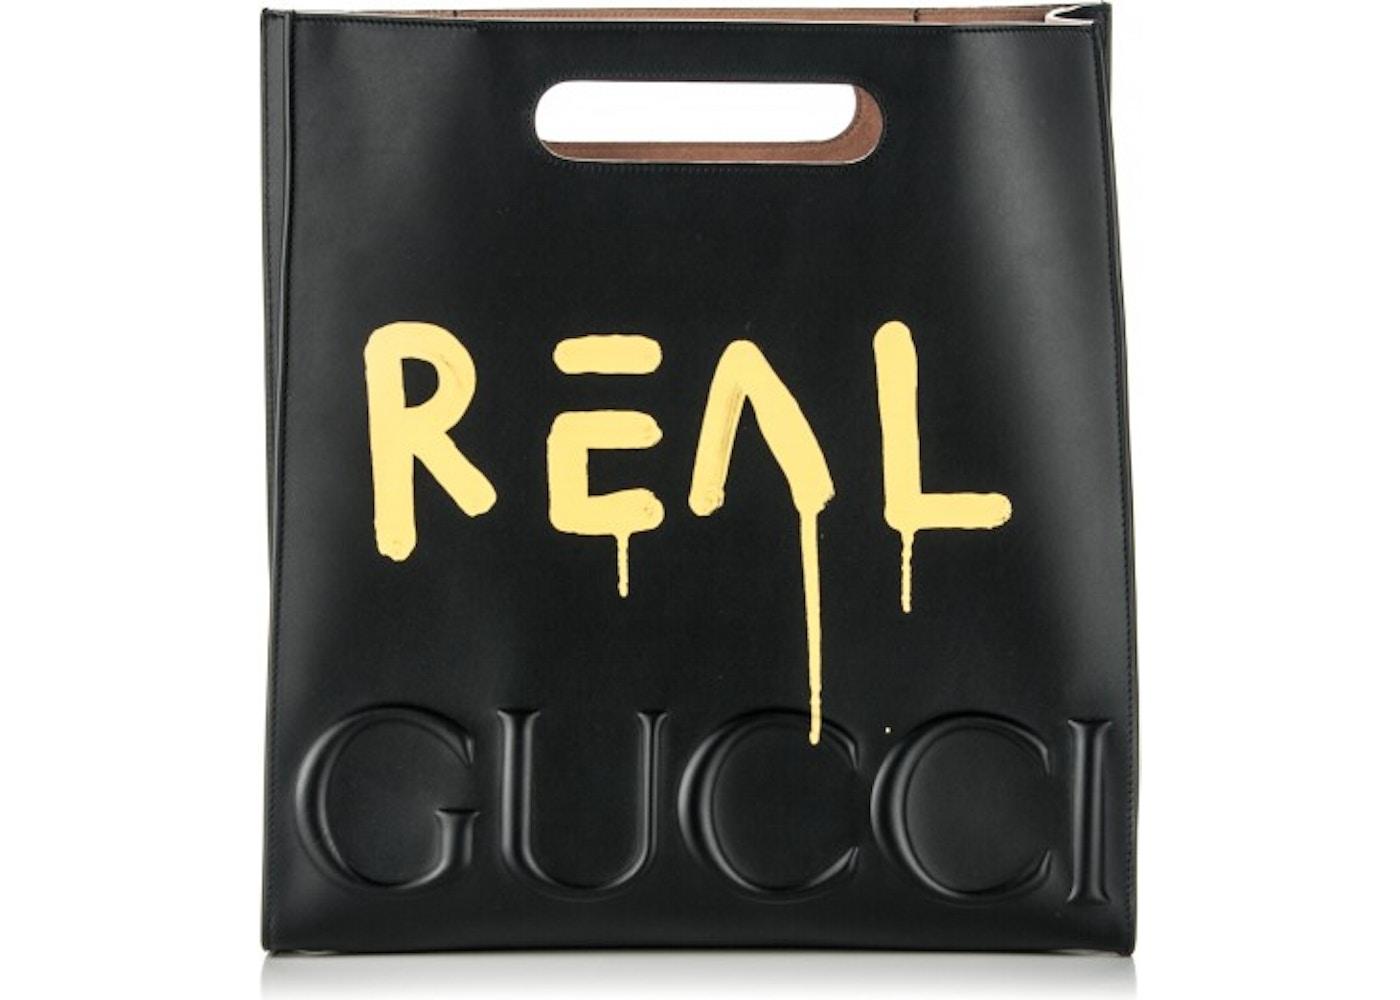 c451ef693271 Gucci GucciGhost XL Tote Embosed Medium. Embosed Medium